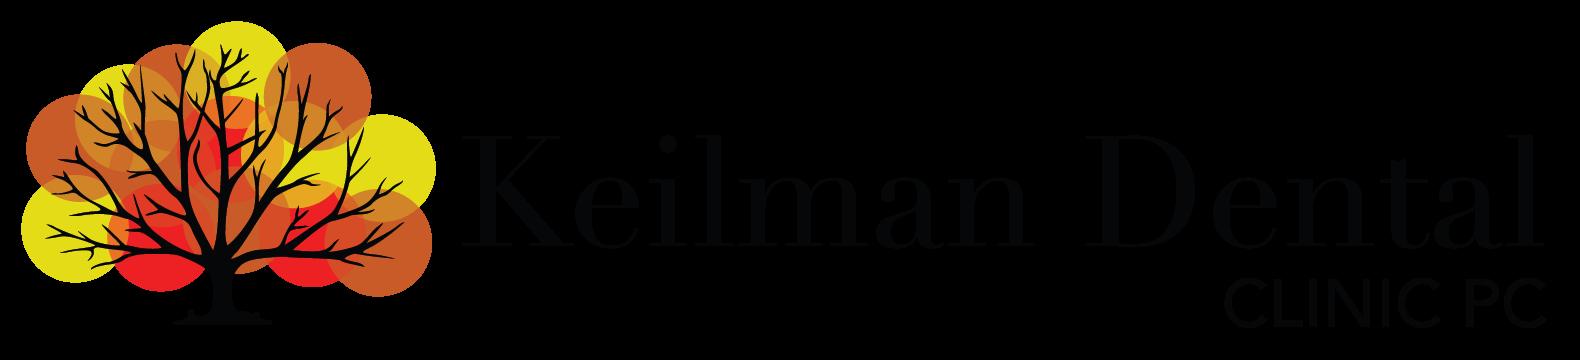 keilman-logohorizontal-color_4-19-16.png